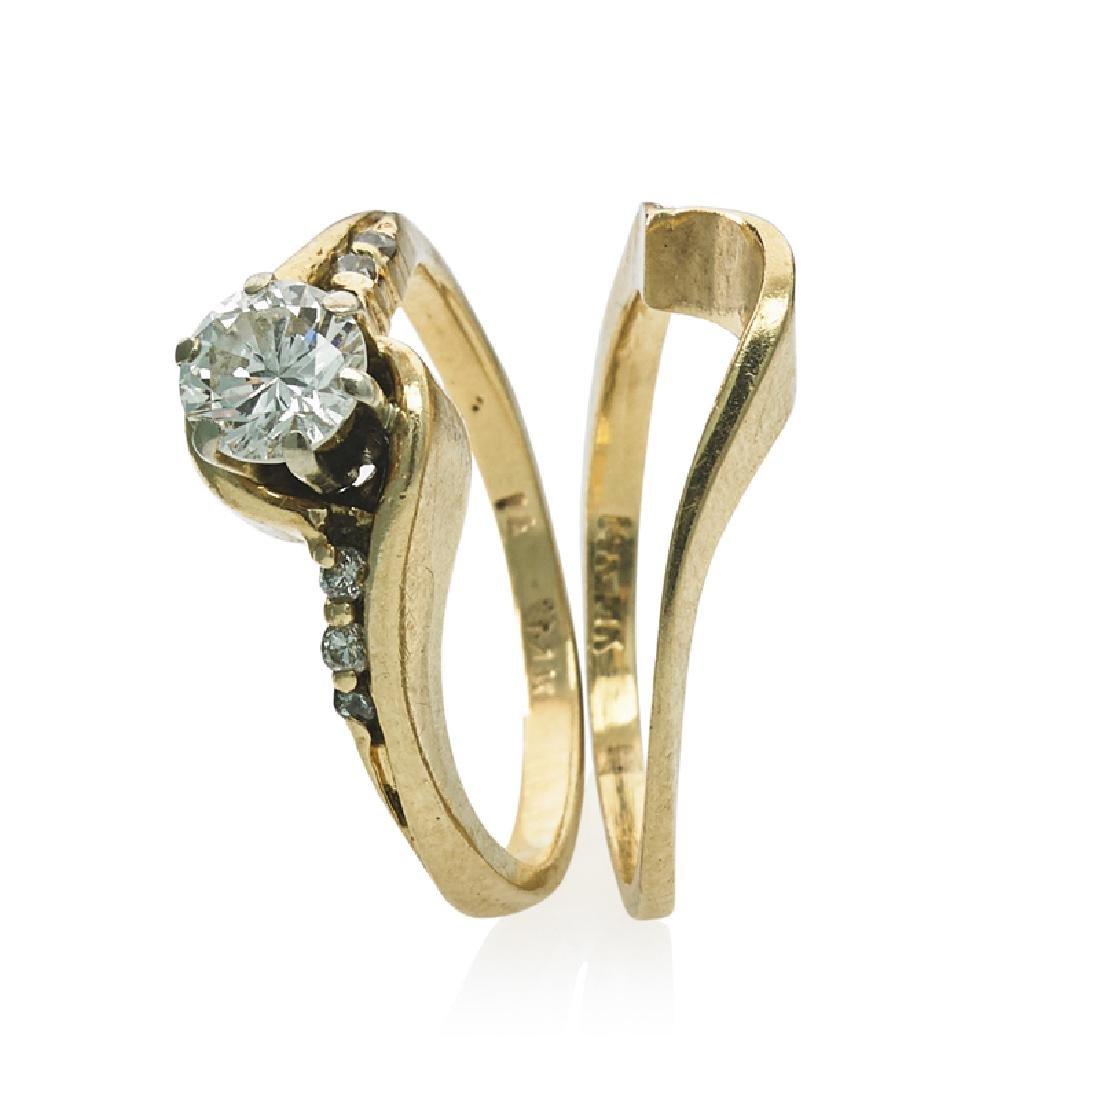 DIAMOND & YELLOW GOLD WEDDING RING SET - 2